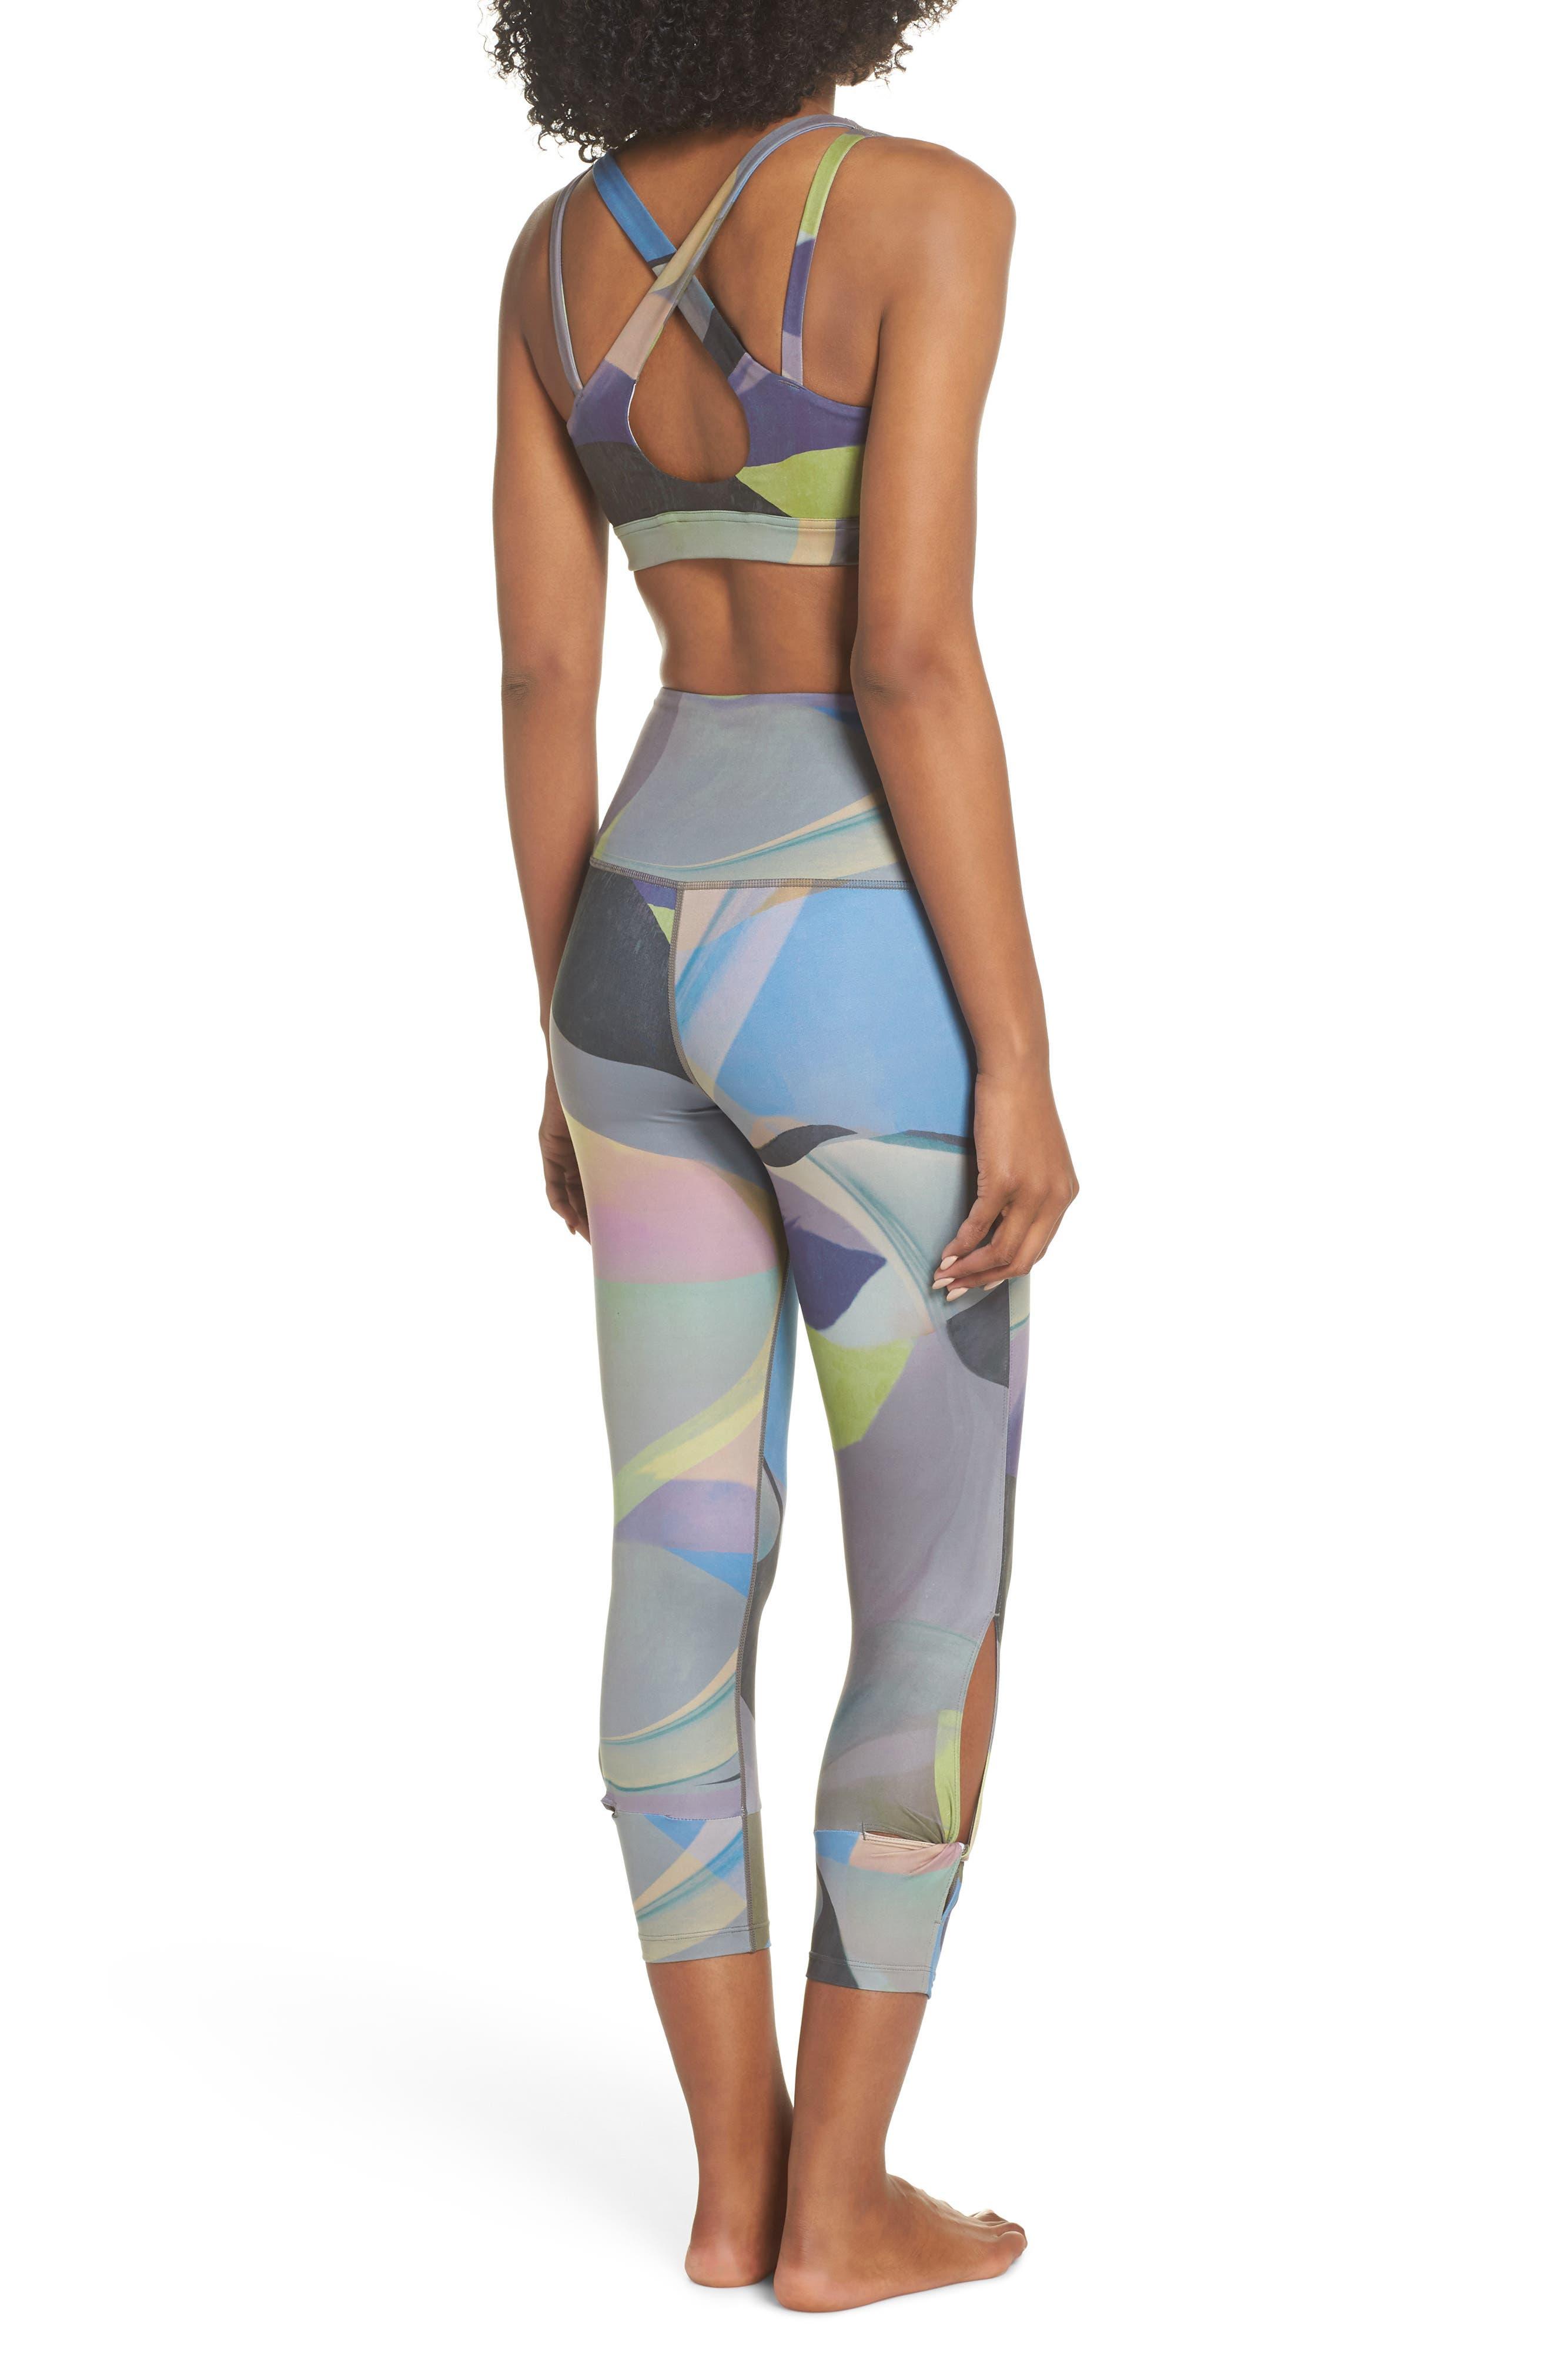 Katya High Waist Abstract Print Recycled Crop Leggings,                             Alternate thumbnail 9, color,                             GREY URBAN ABSTRACT BOTANICAL